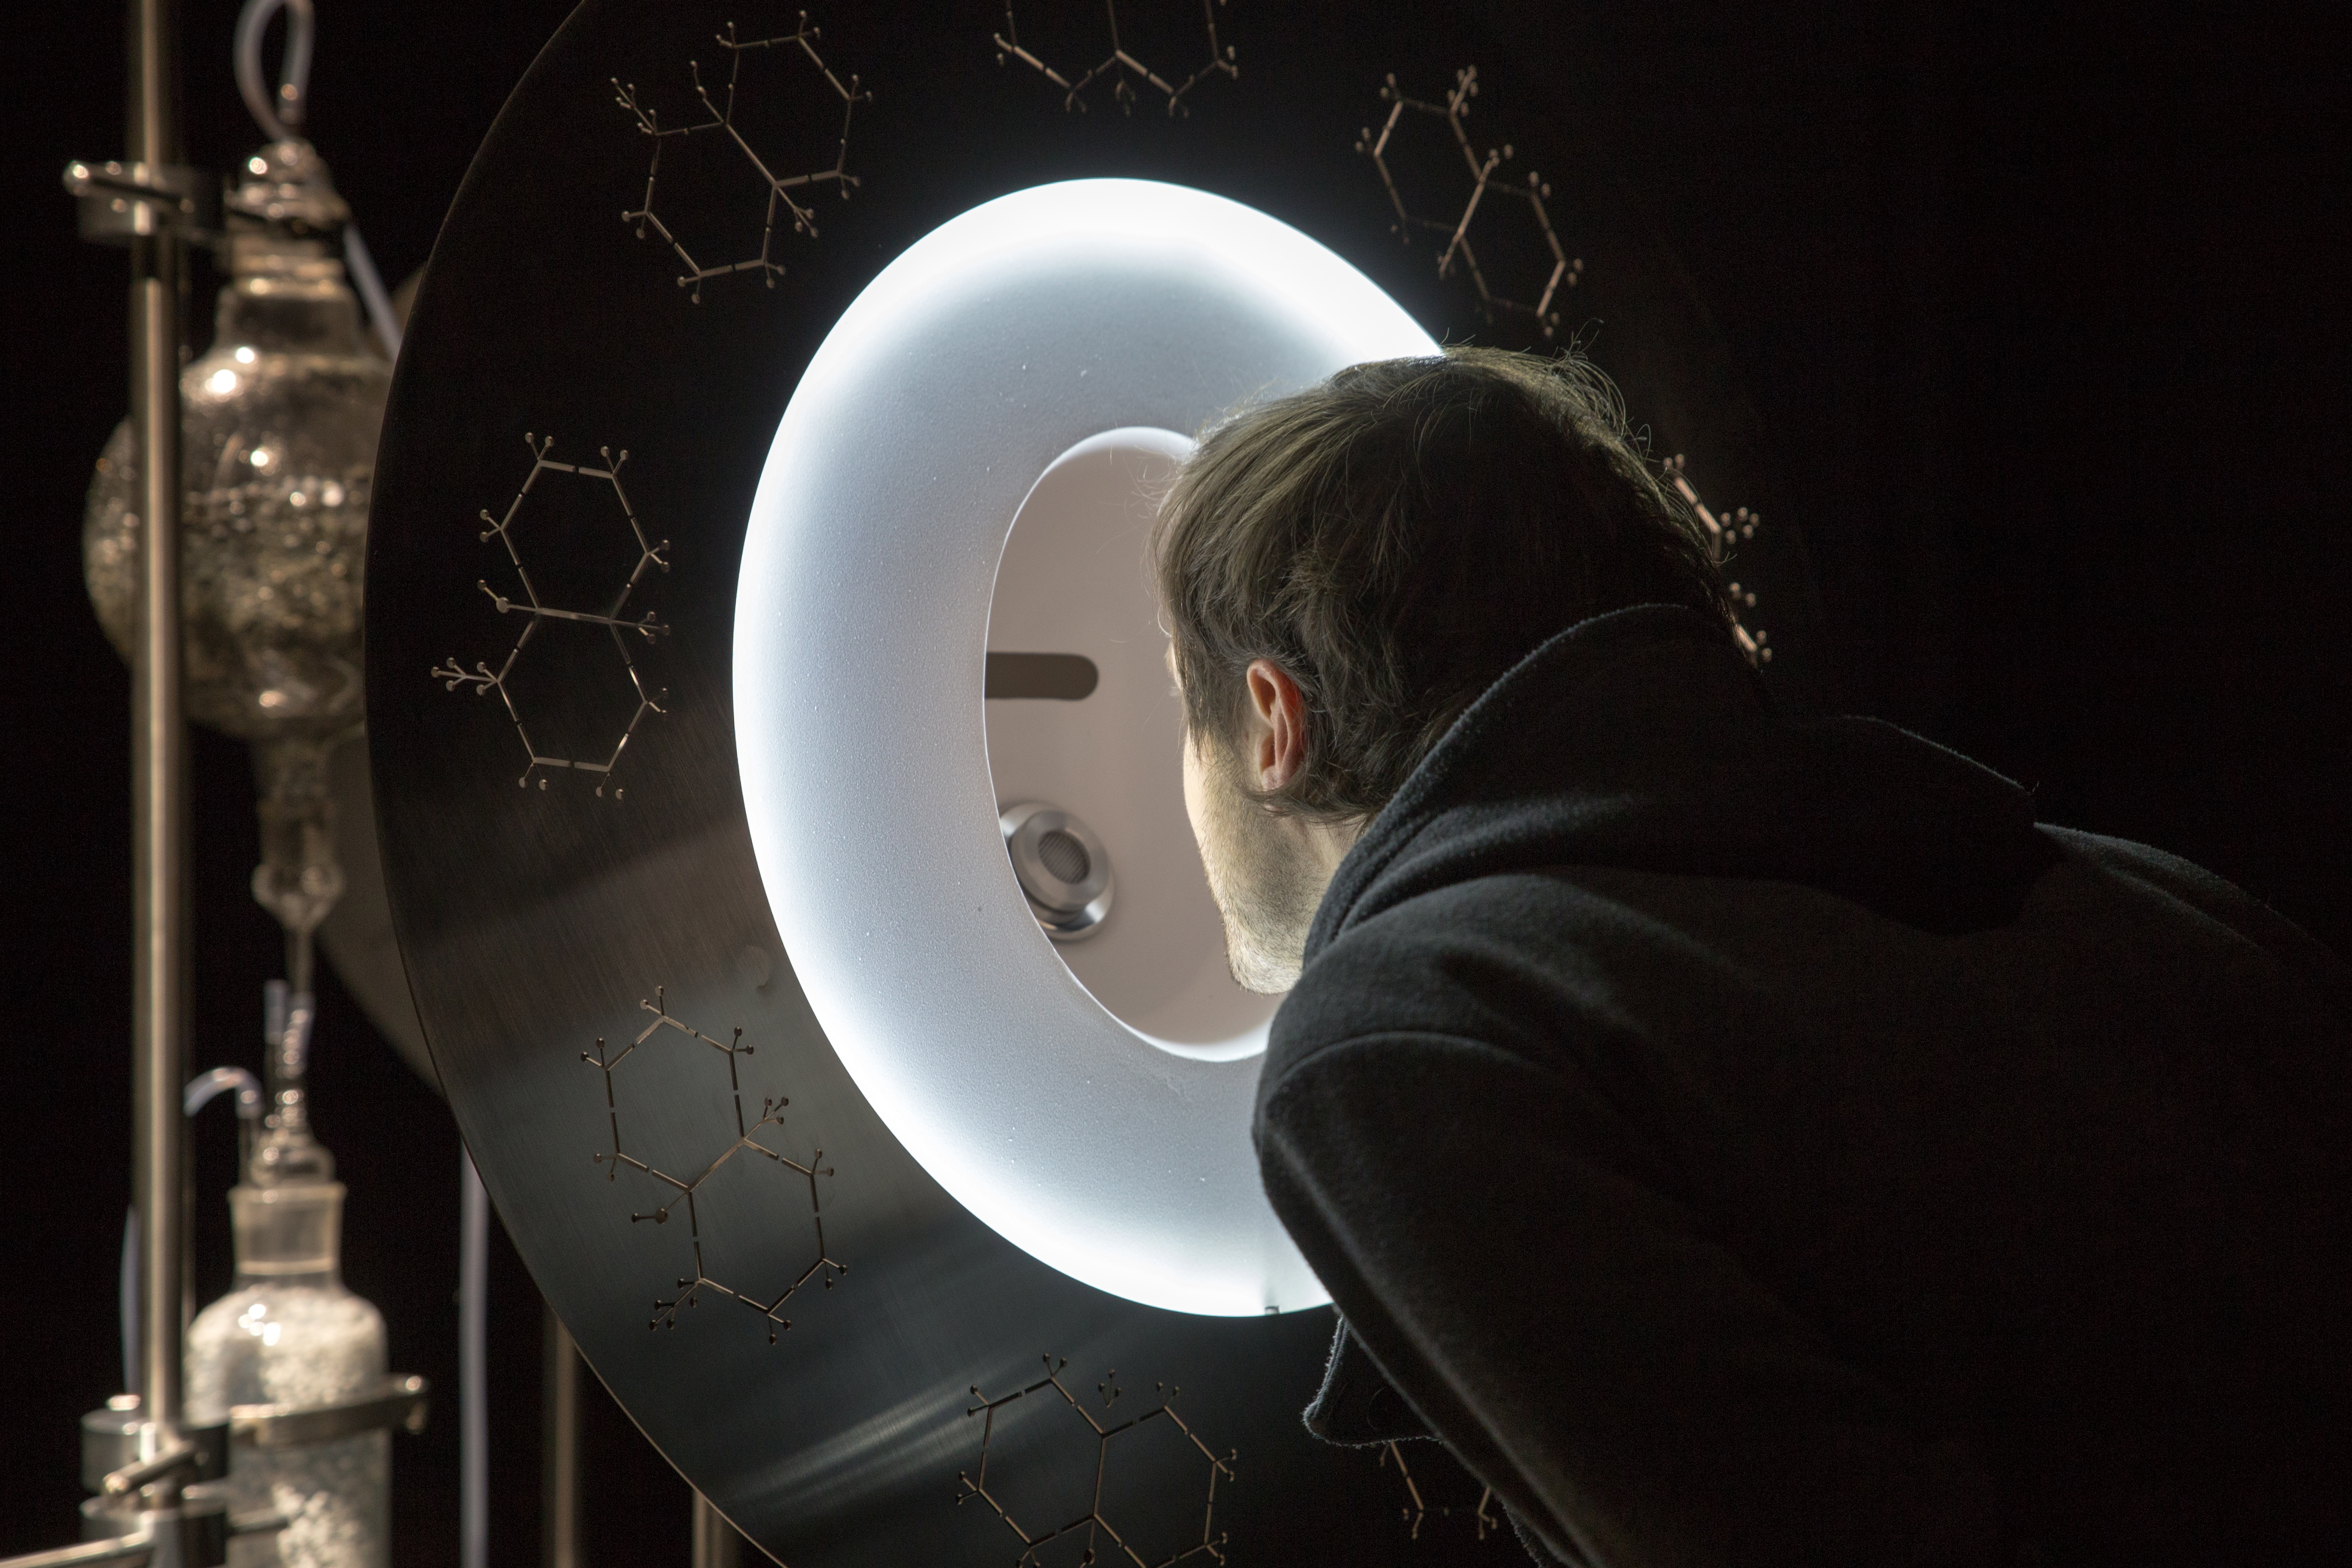 Visiting artist Saša Spačal: 'Connections Continuum'